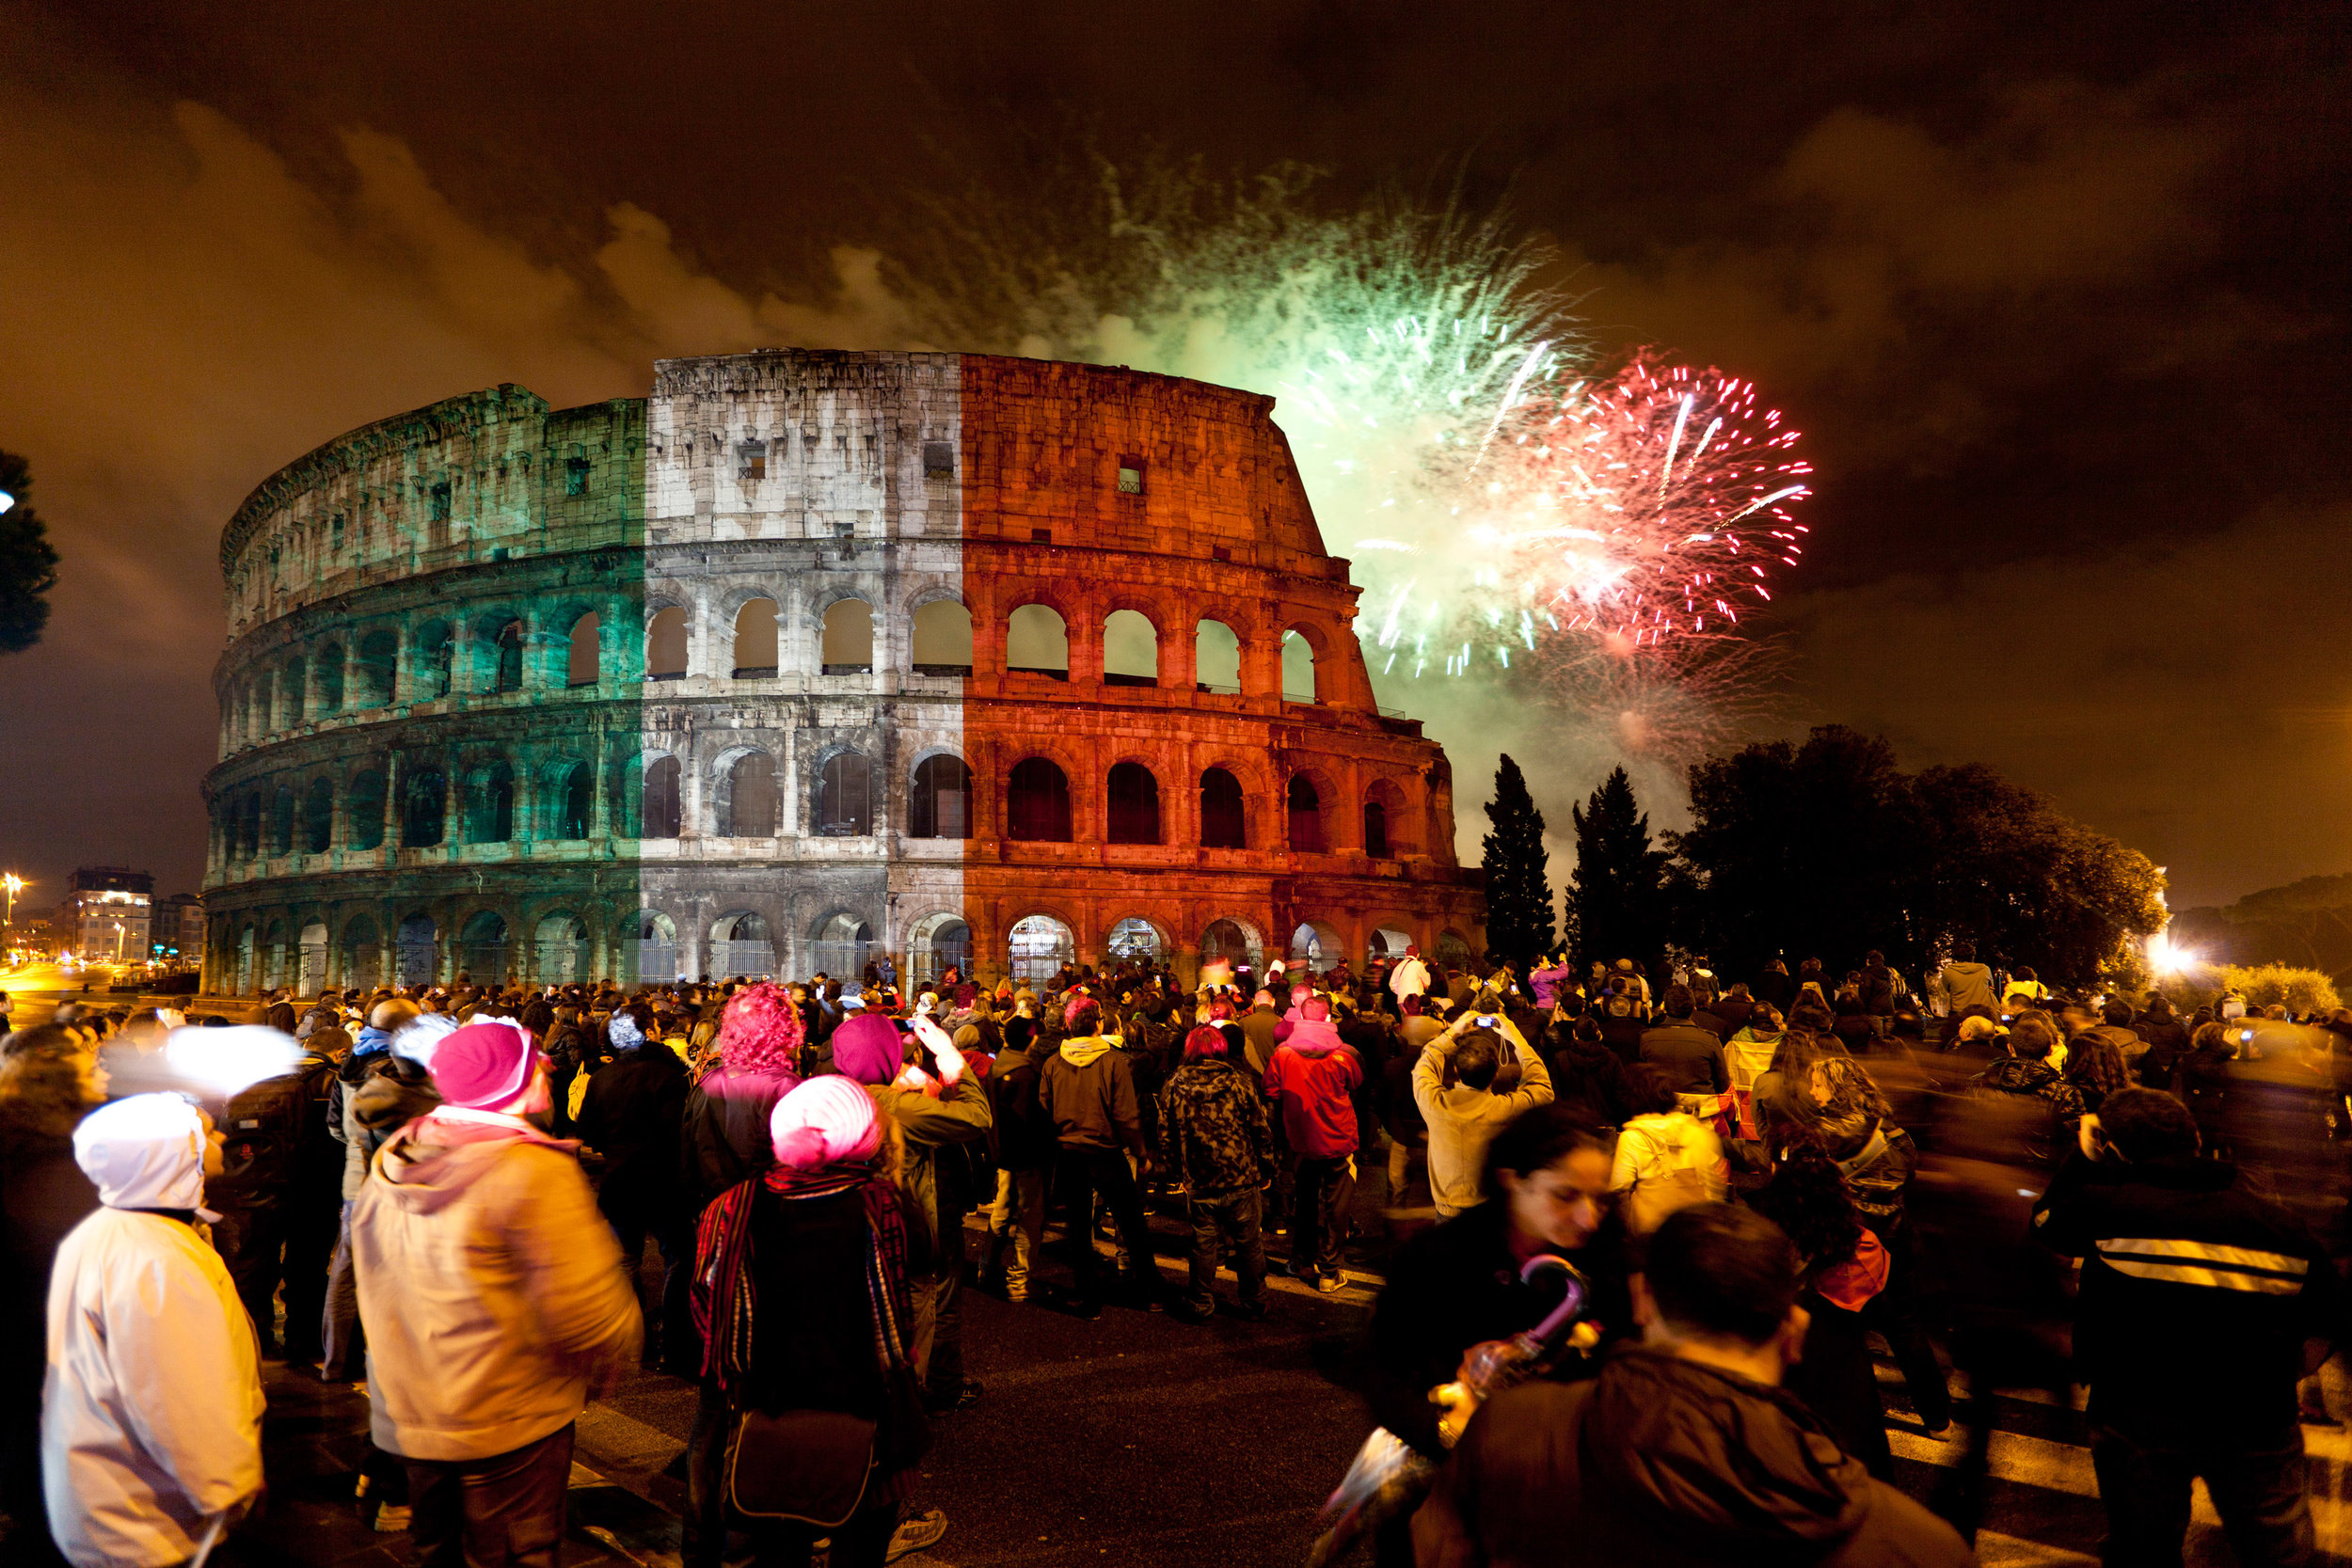 COLOSSEUM – ROME, ITALY